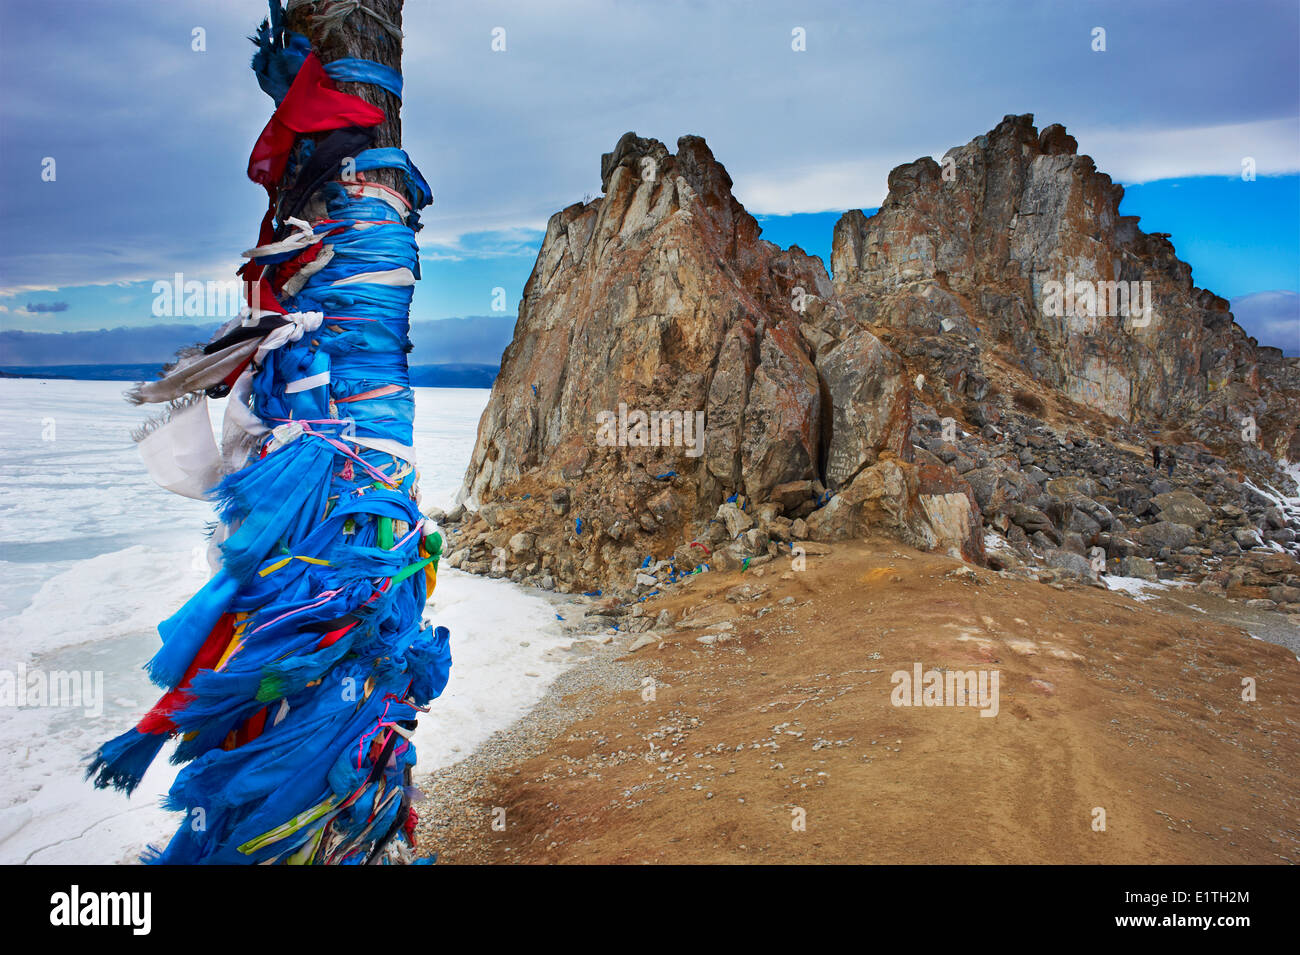 La Russie, la Sibérie, oblast d'Irkoutsk, le lac Baïkal, Maloe More (petite mer), lac gelé en hiver, l'île Olkhon, Shaman rock Photo Stock